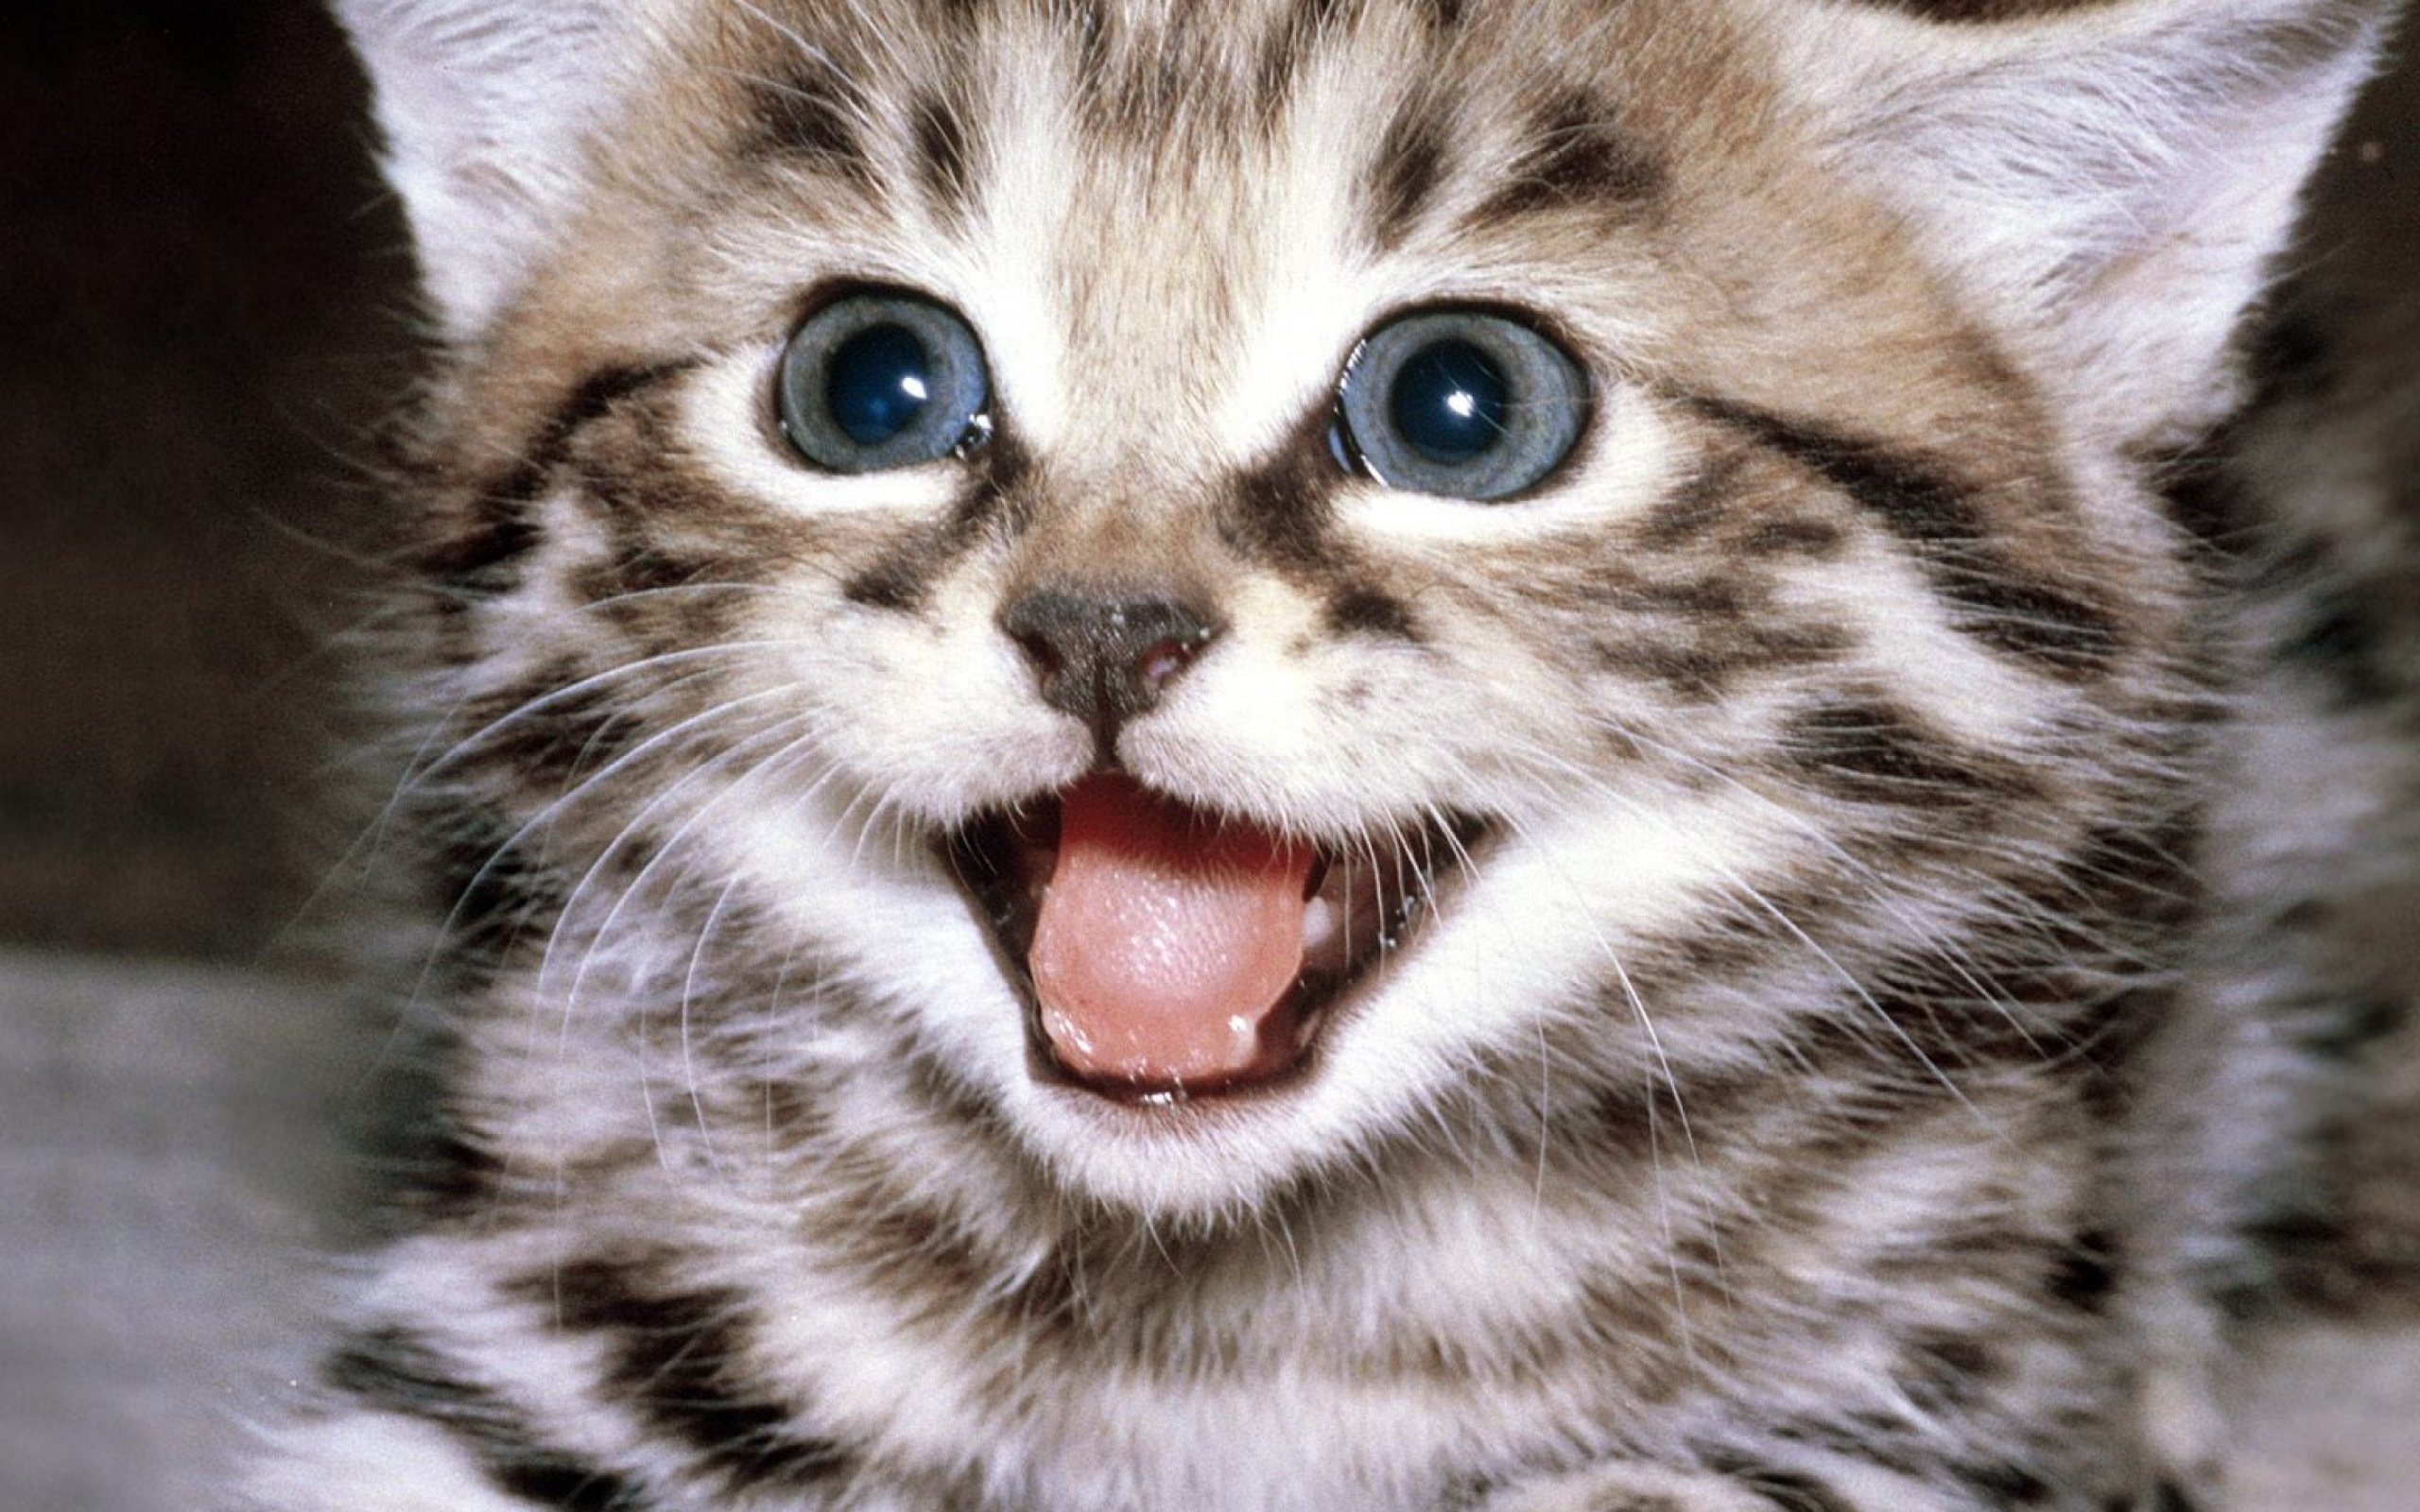 kittens, Kitten, Cat, Cats, Baby, Cute Wallpapers HD ...